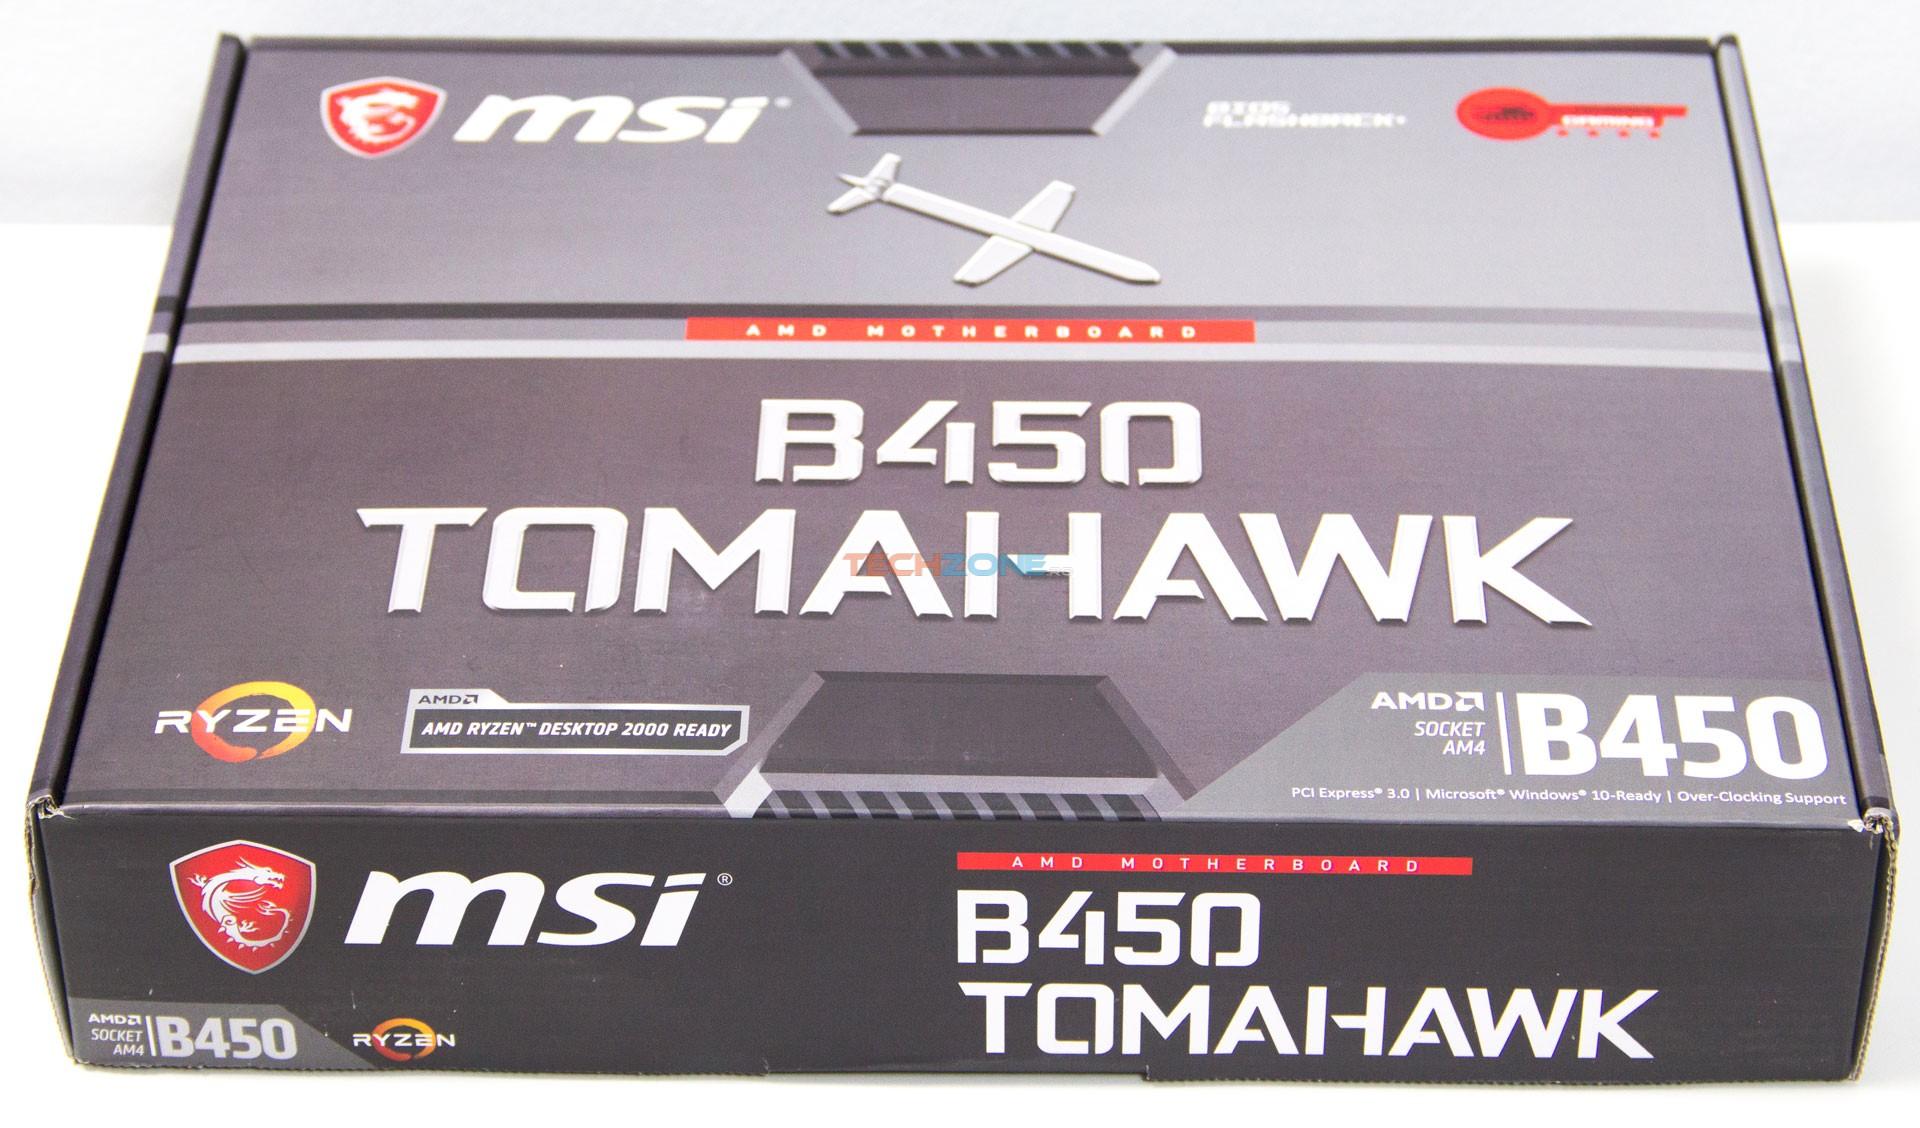 MSI B450 Tomahawk set